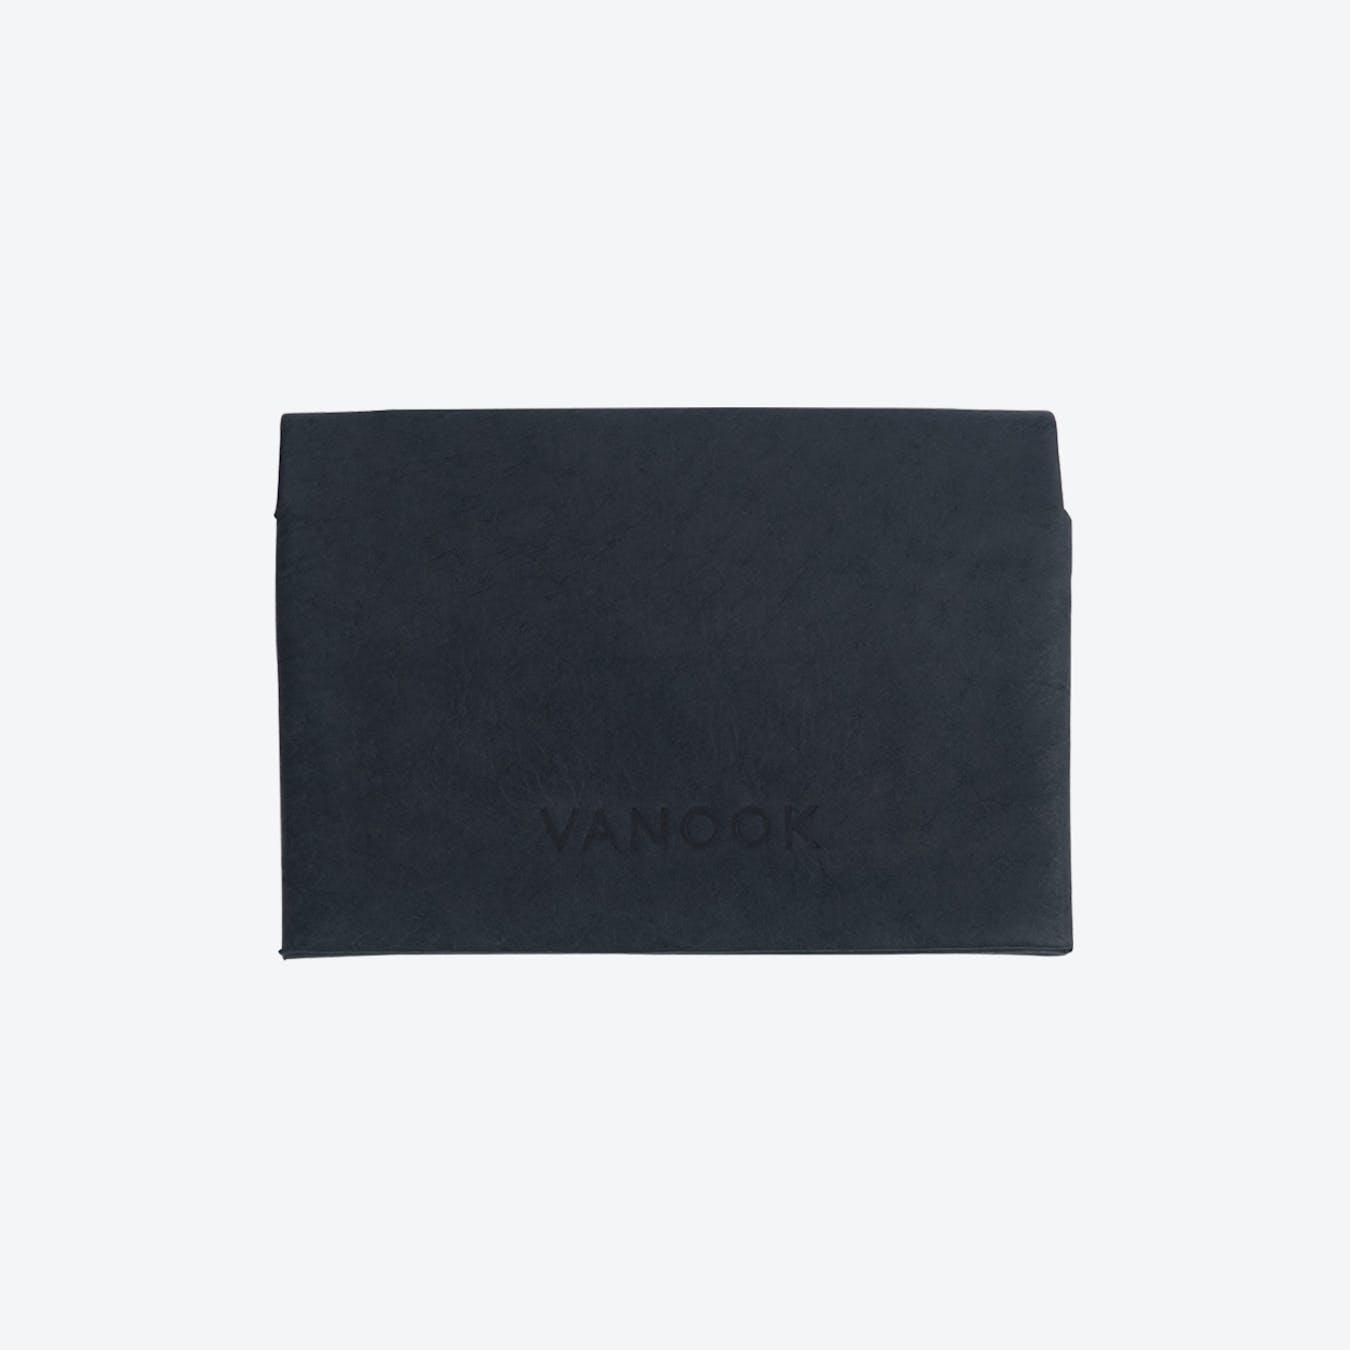 Small Bi-Fold Card Case in Charcoal